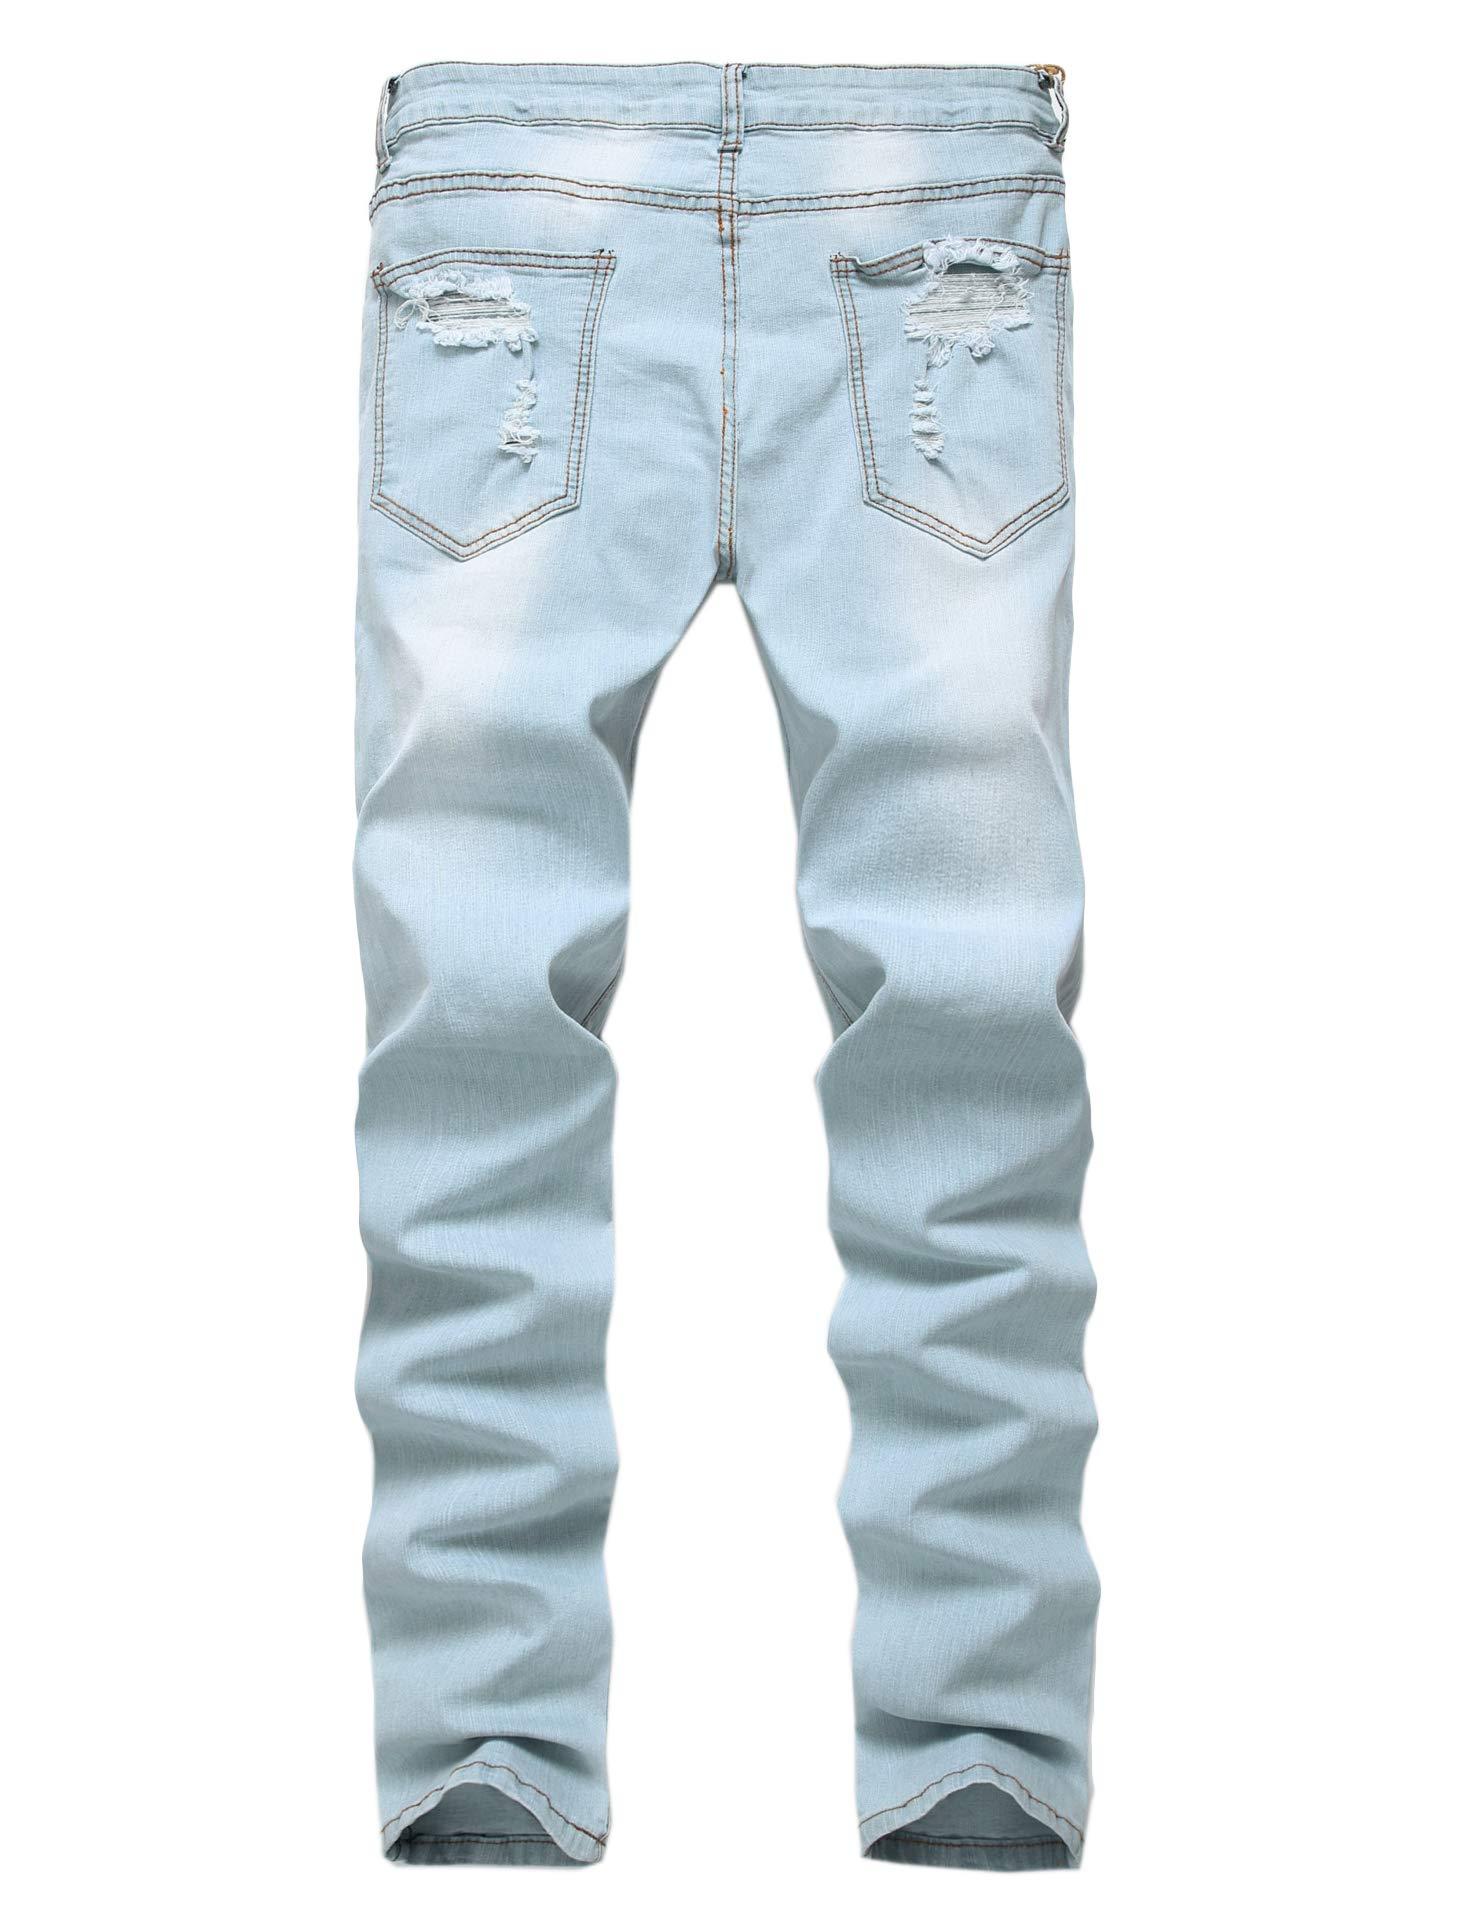 Enrica Men's Ripped Skinny Destroyed Holes Jeans Slim Fit ...